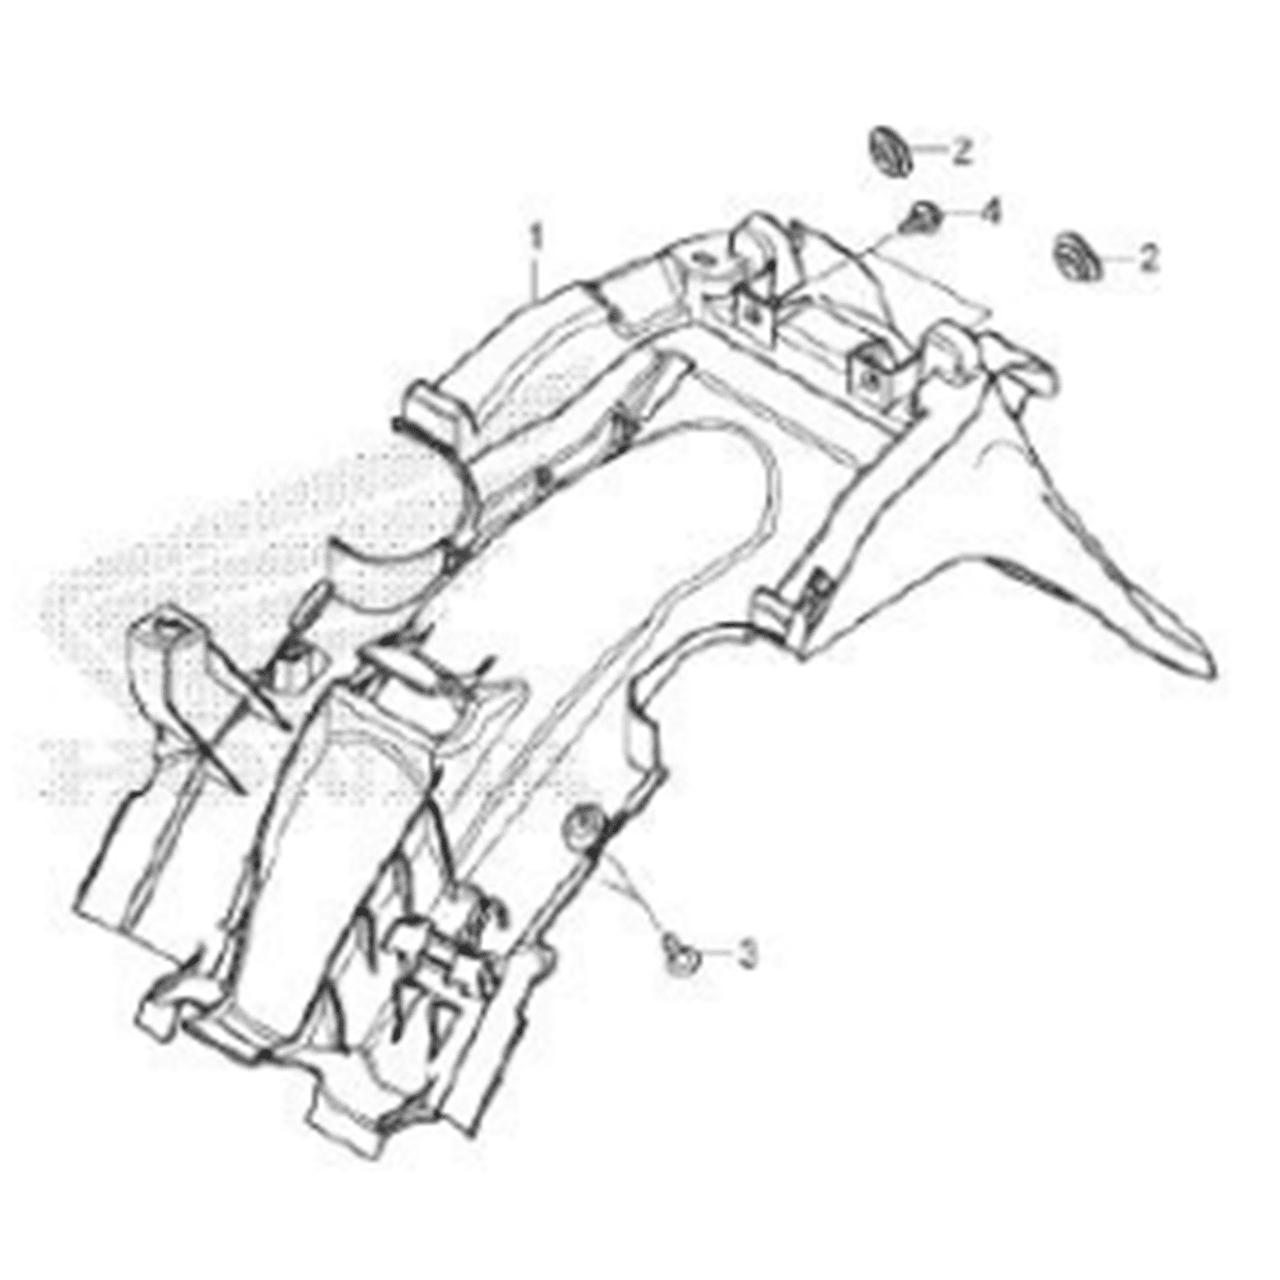 Kit Paralama + Carenagem Biz 125 2018 2019 2020 Original Honda